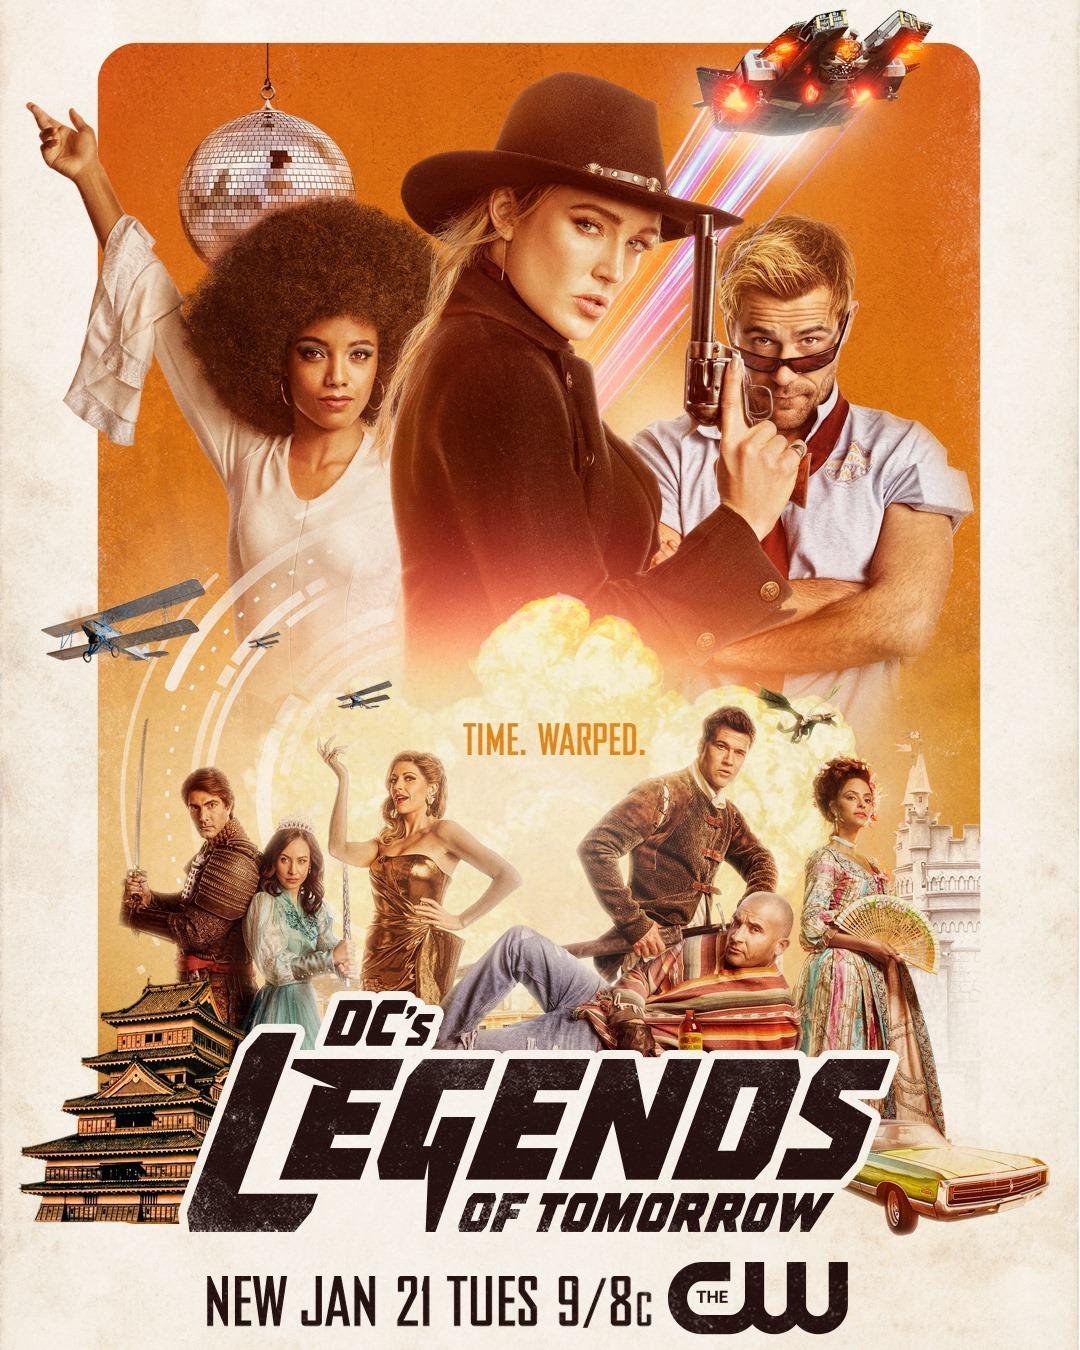 DCs.Legends.of.Tomorrow.S04E13.MULTi.1080p.HDTV.H264-SH0W